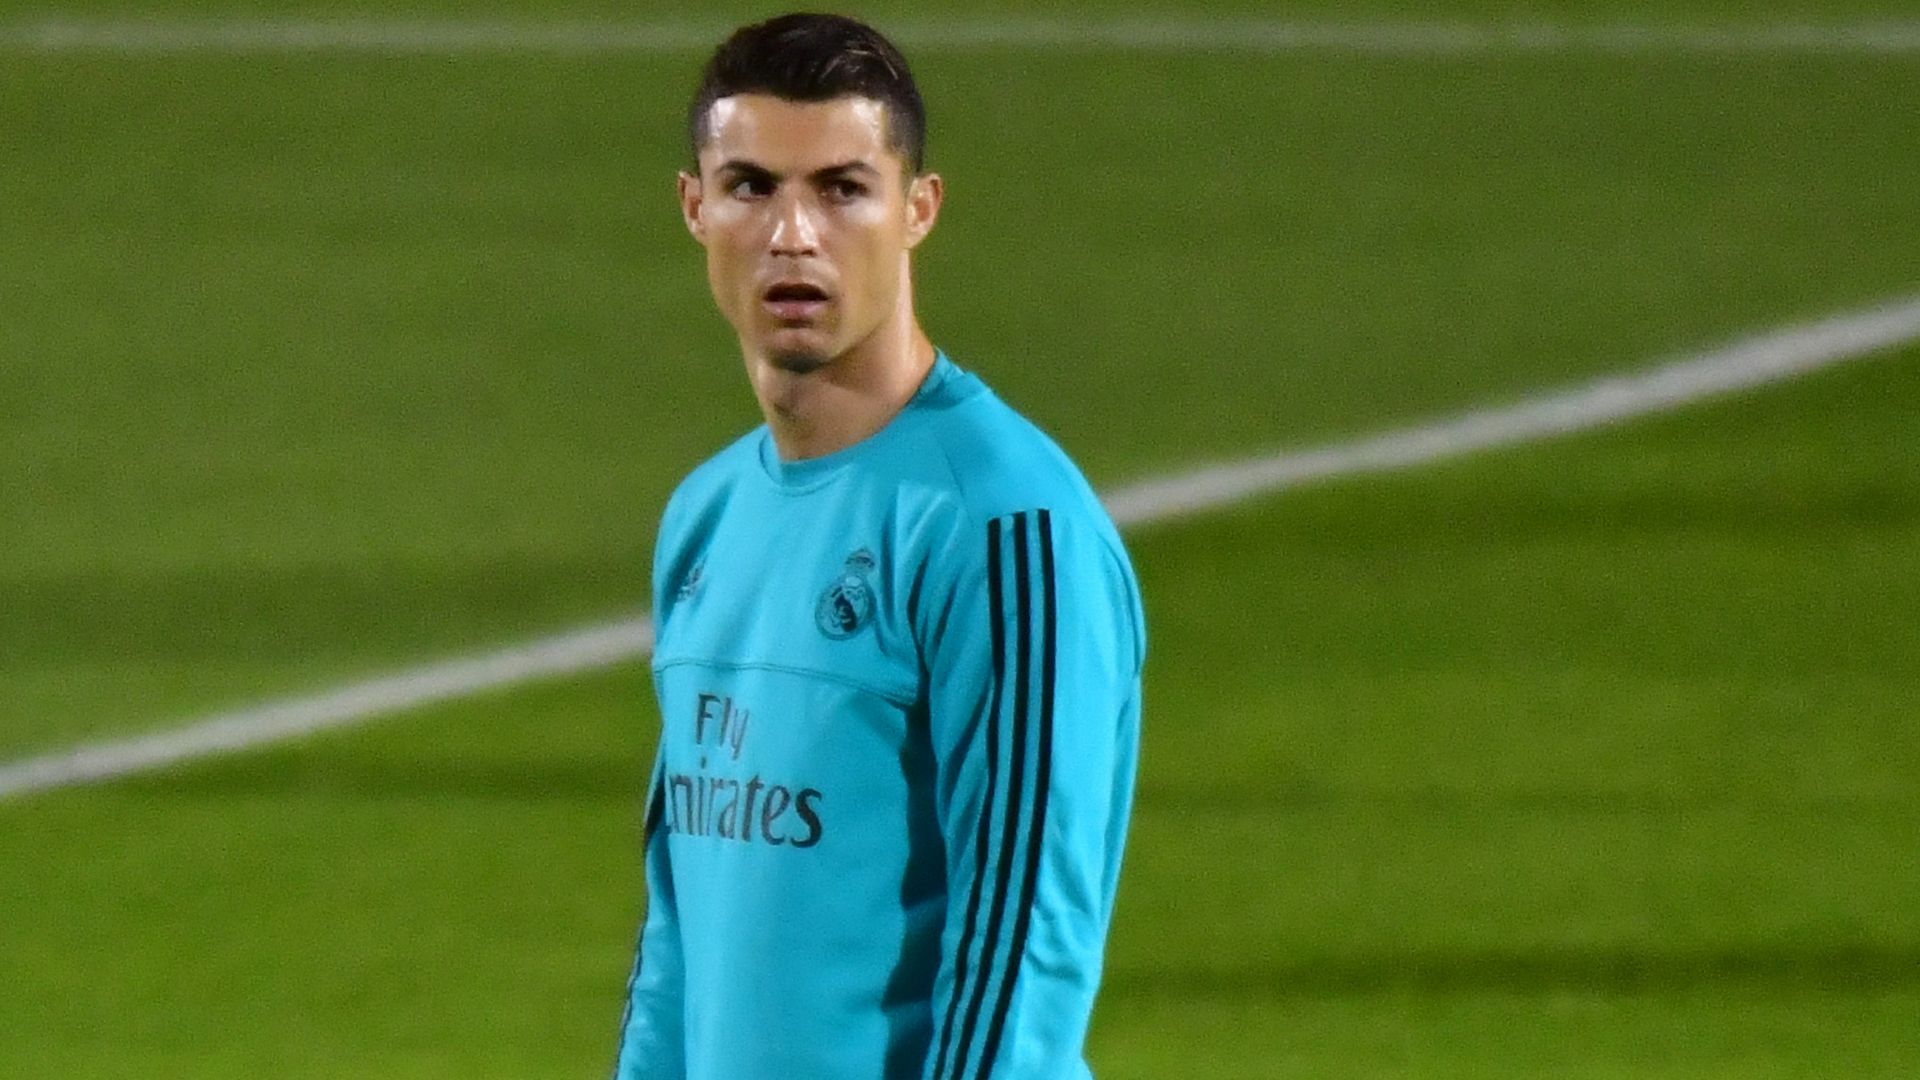 Cristiano Ronaldo Real Madrid Club World Cup training 11122017